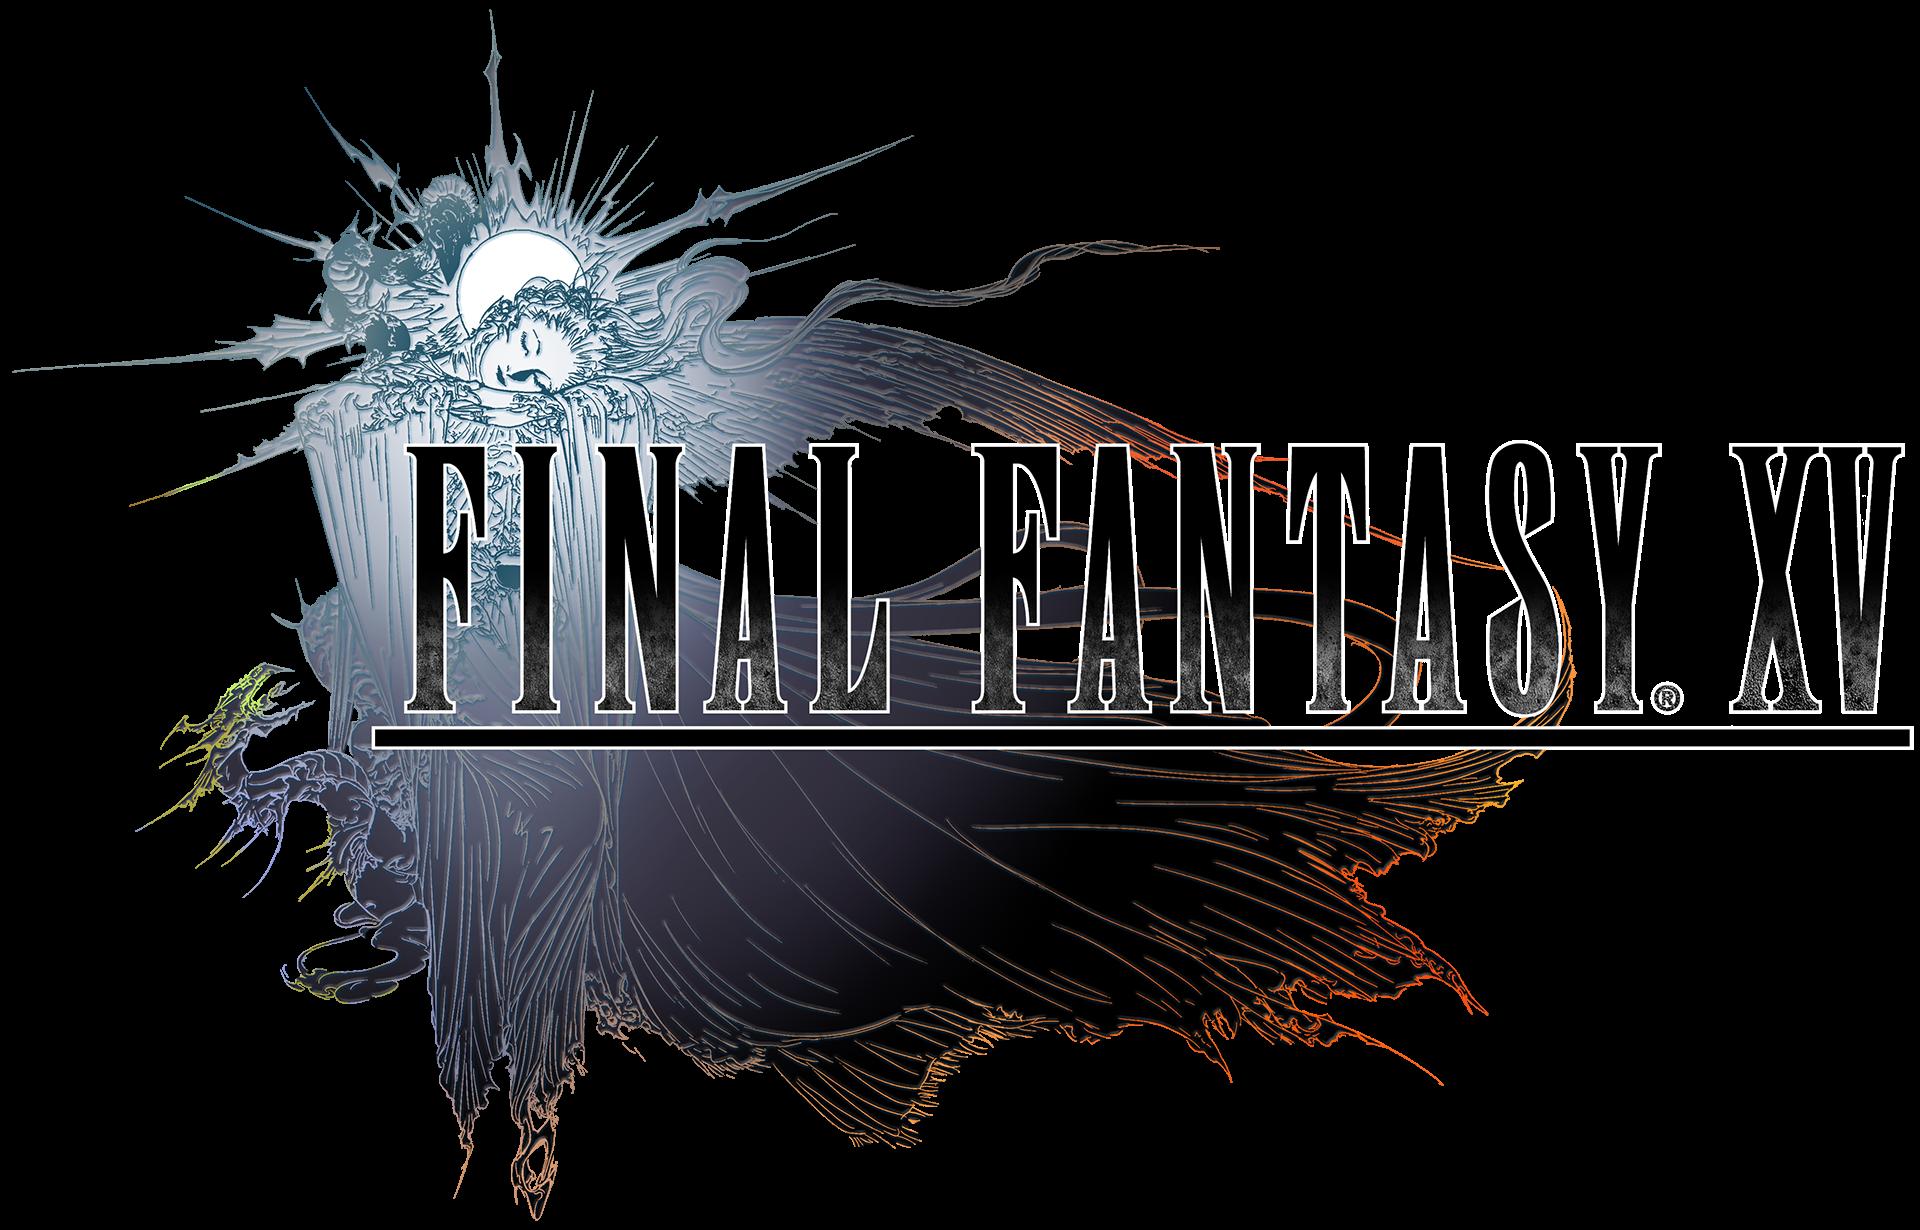 Final Fantasy Xv Final Fantasy Xv Final Fantasy Logo Final Fantasy 15